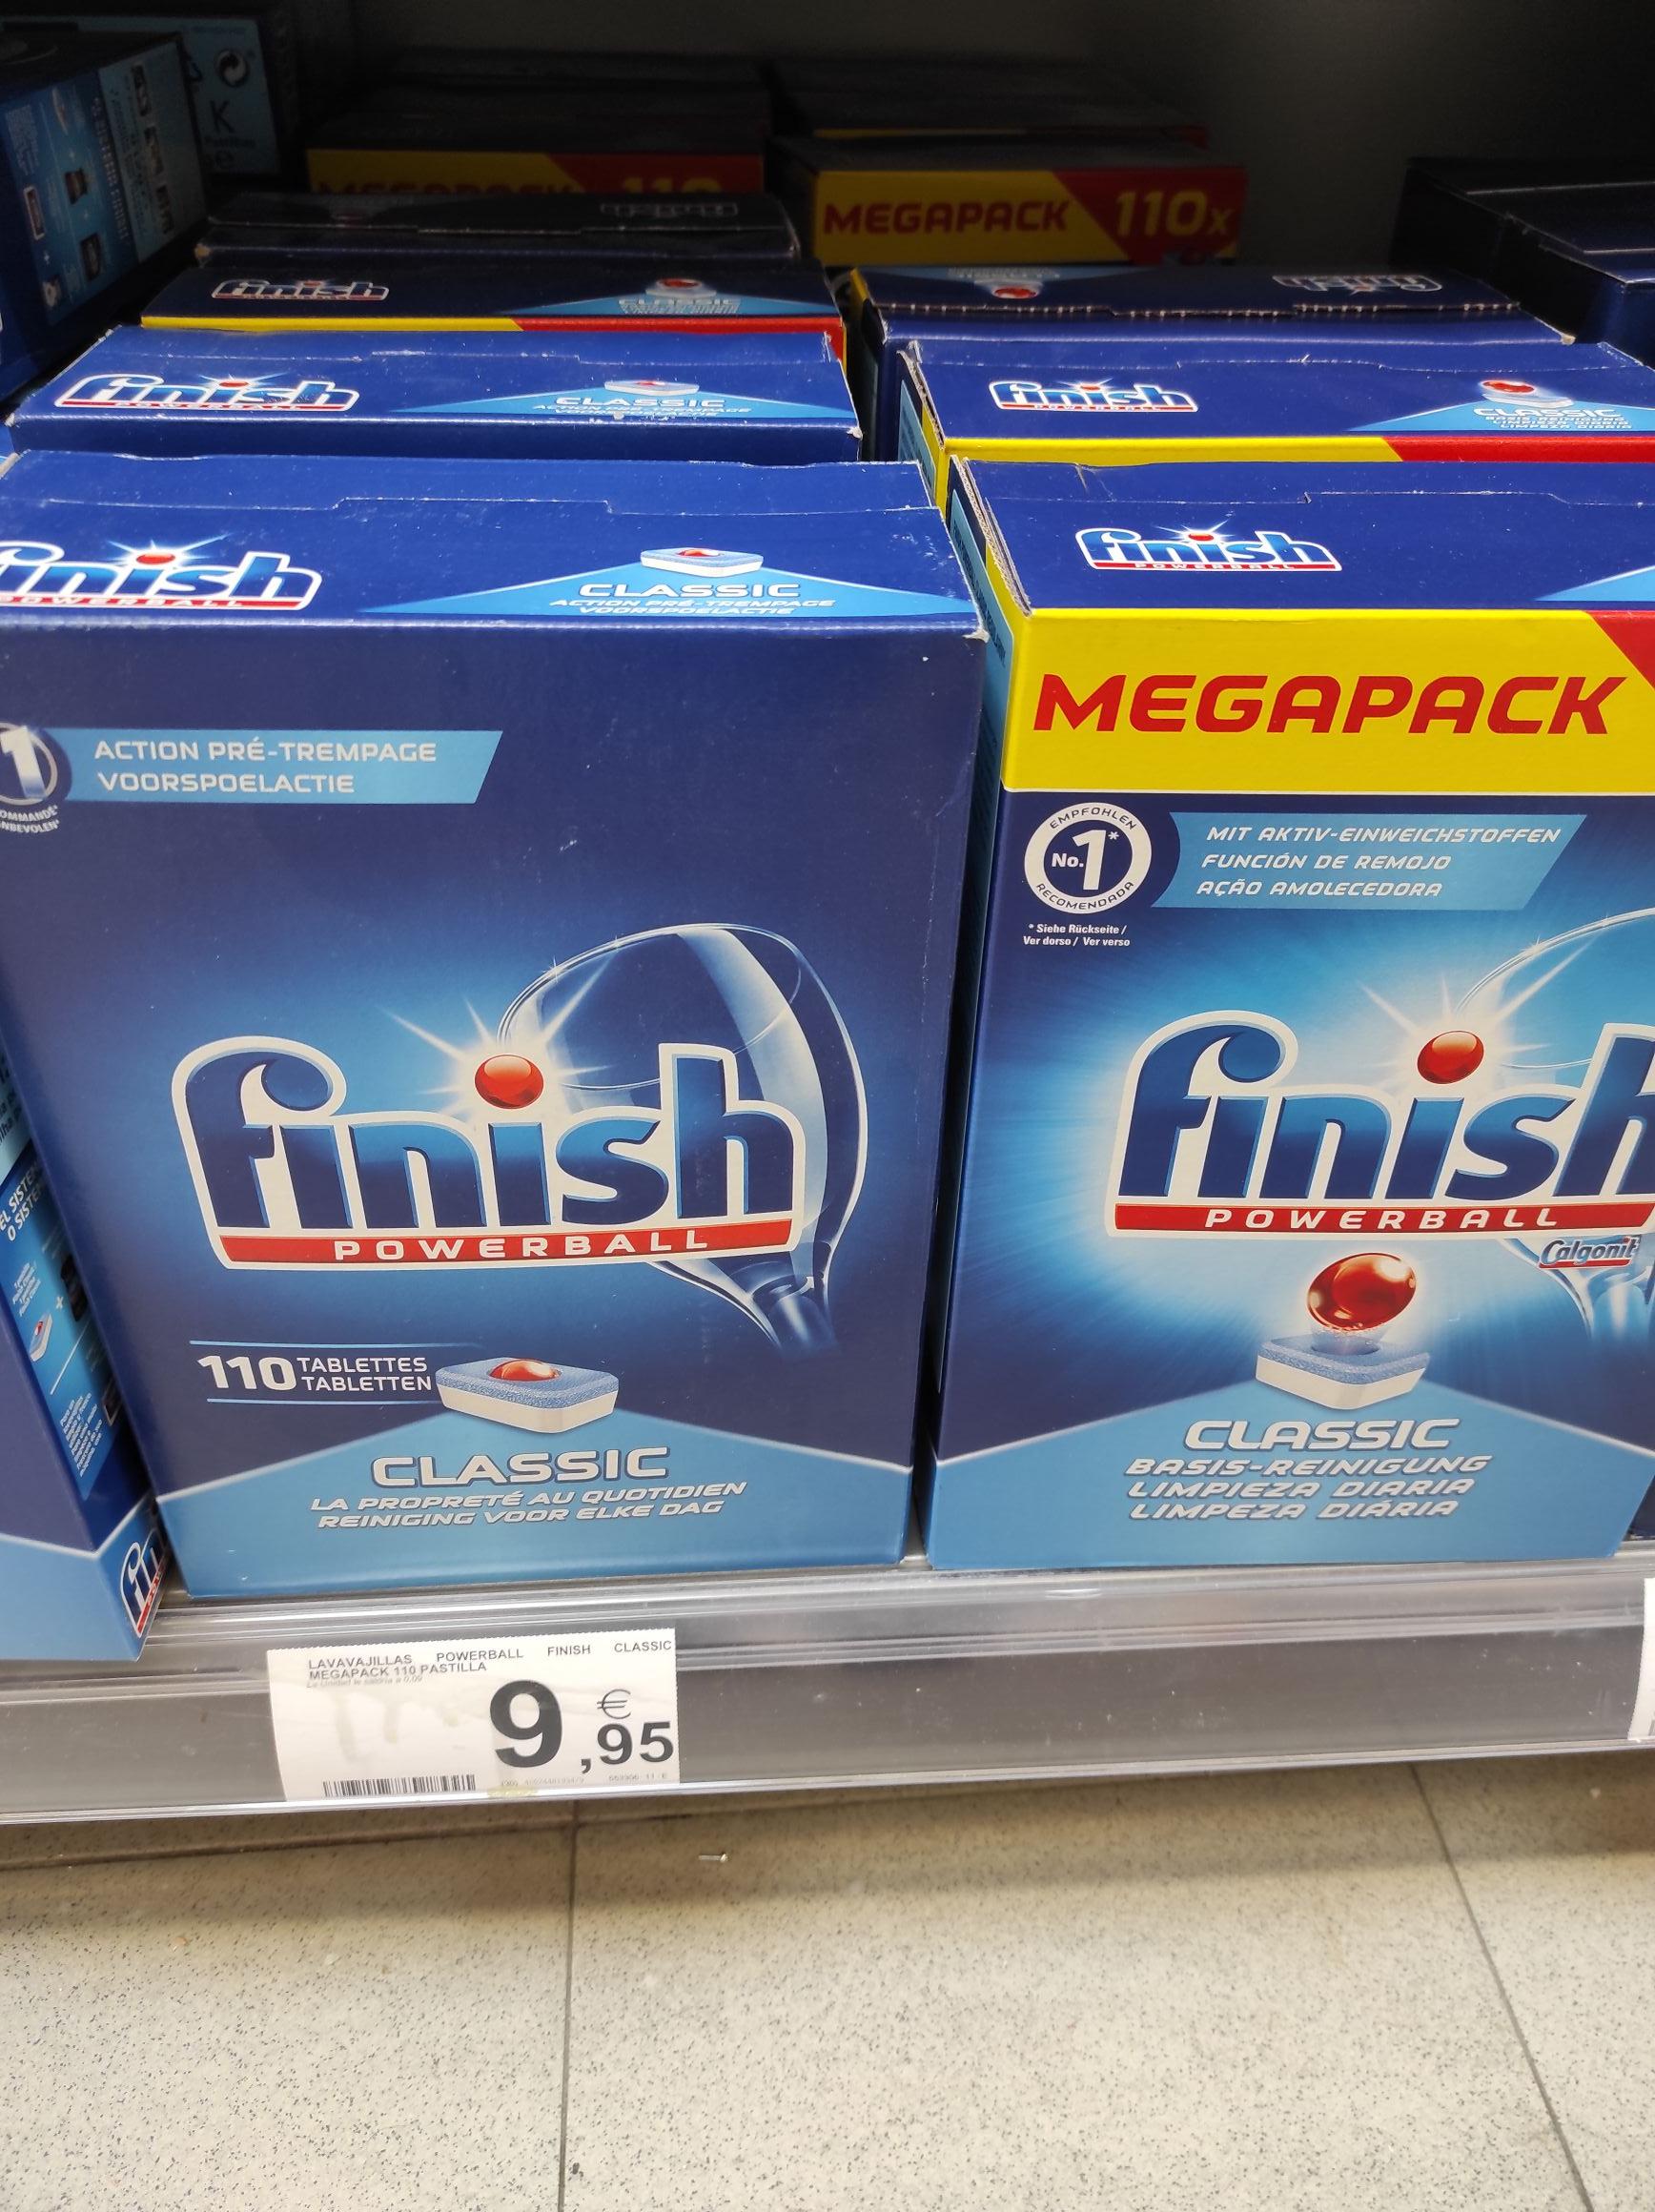 Pastillas finish lavavajillas 110 unidades